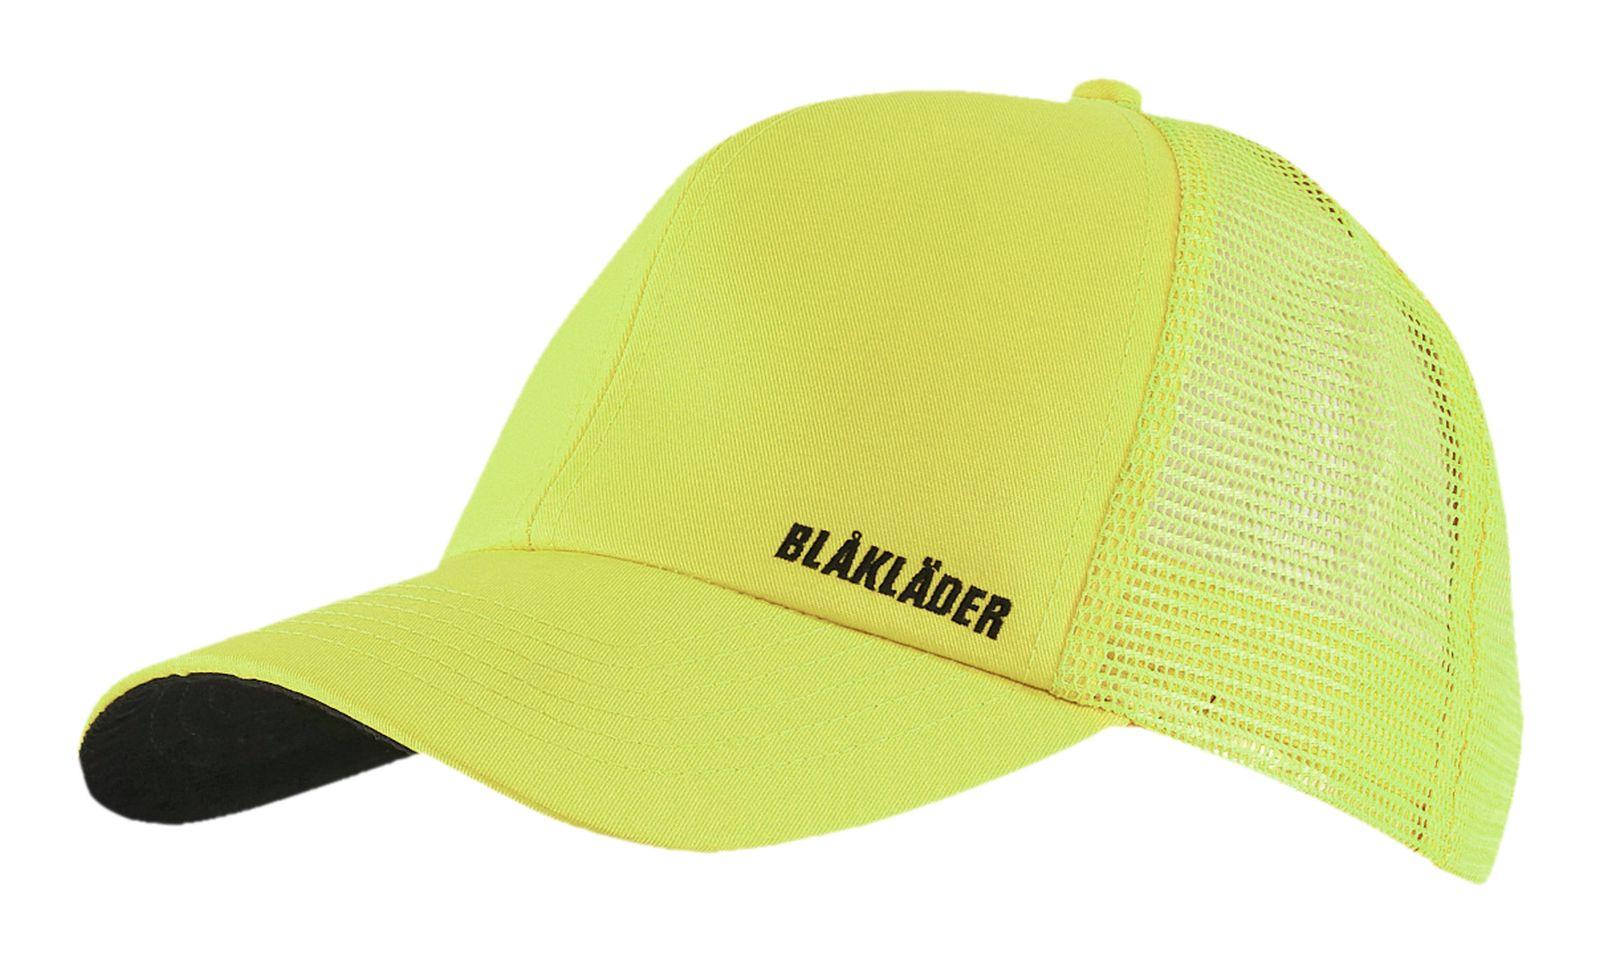 Blaklader Caps 20730000 High Vis fluo-geel(3300)